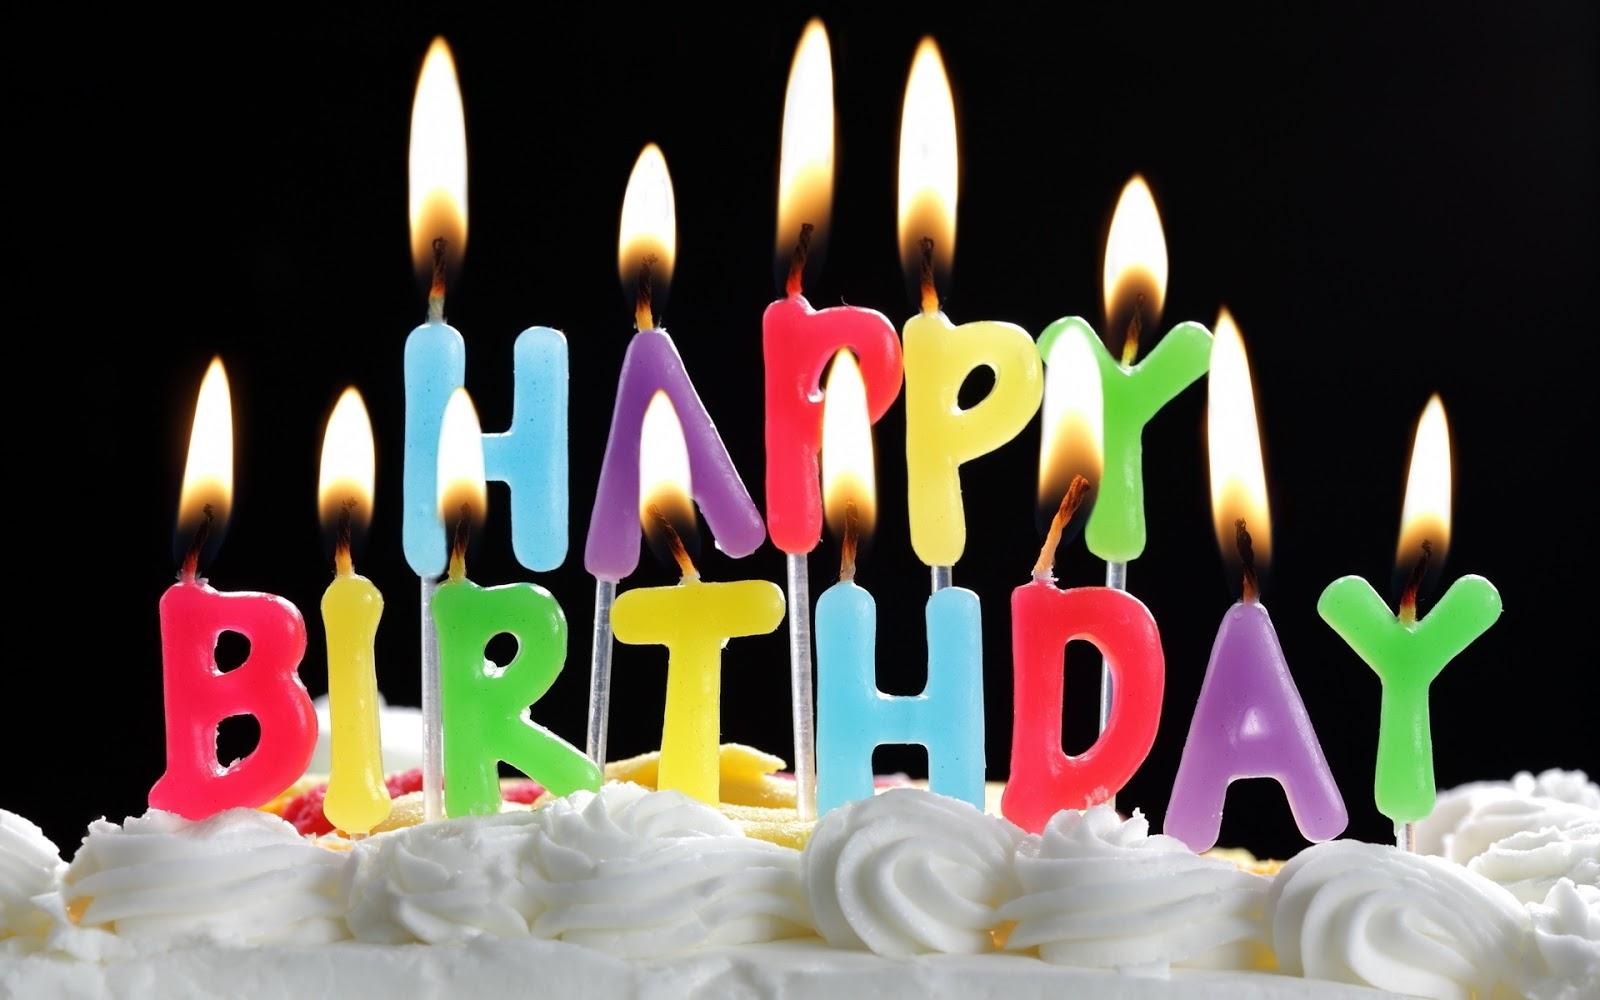 http://4.bp.blogspot.com/-lFsEjE-37e8/UeQONYPolzI/AAAAAAAAB4M/USjKkuxJ9dA/s1600/happy_birthday_cake_with_candleswide.jpg